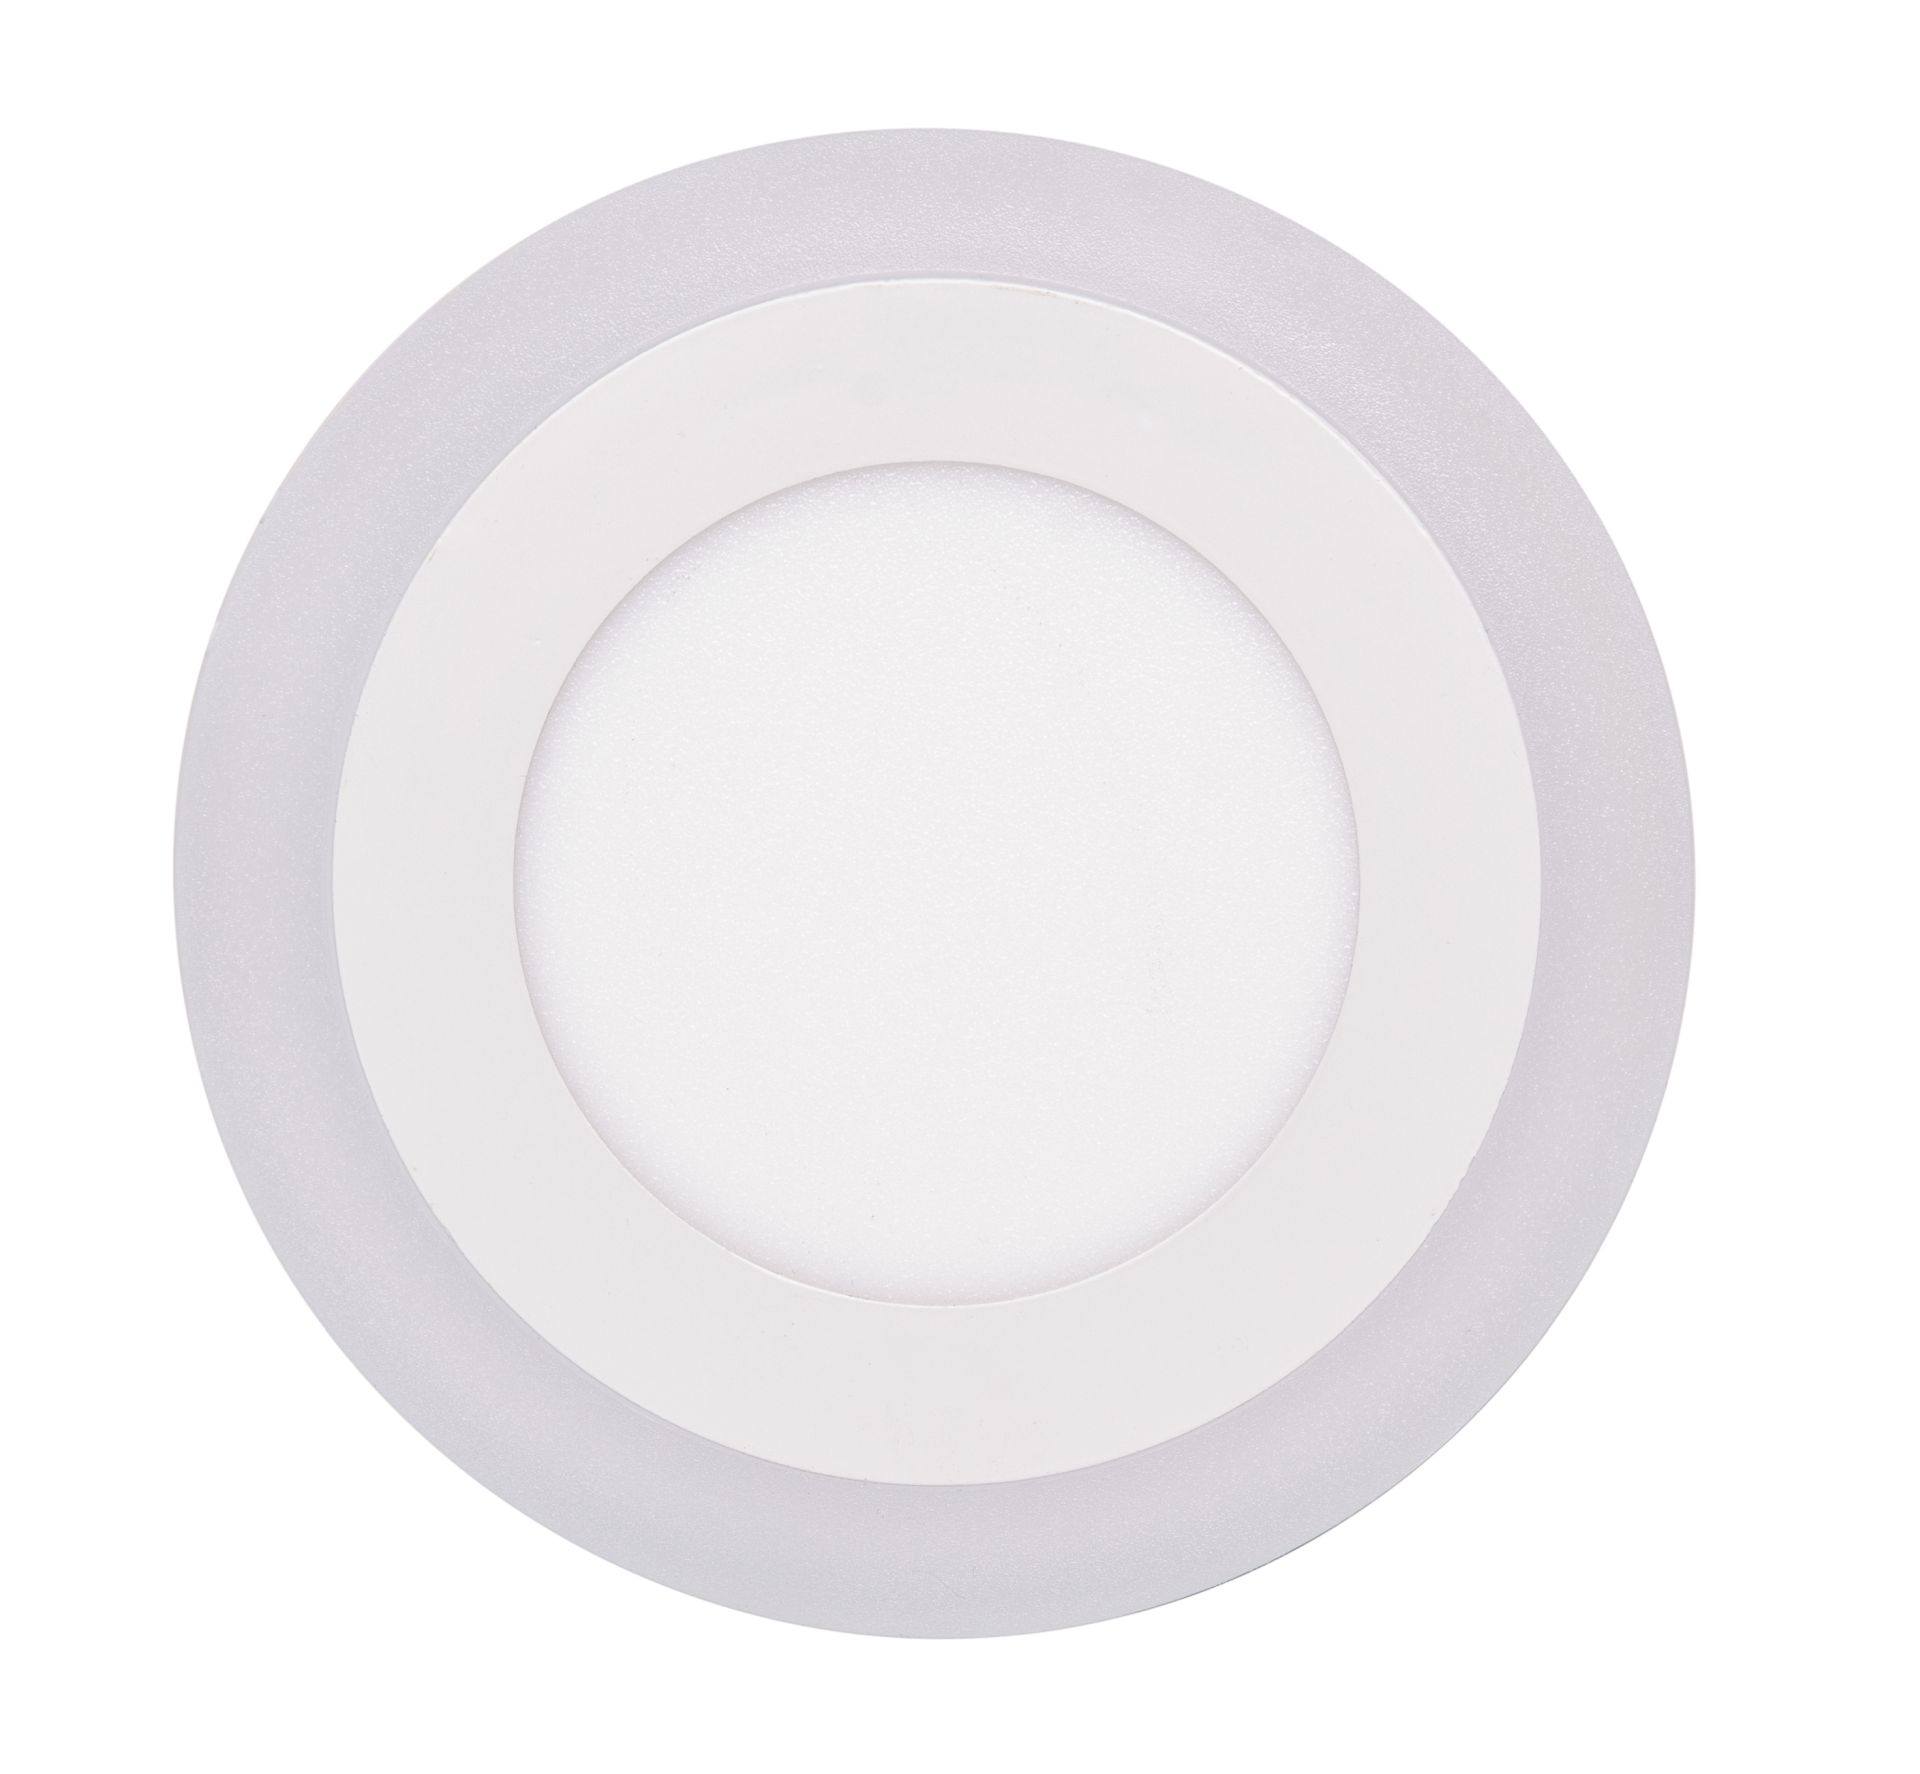 Solight Biely vstavaný LED panel guľatý 145mm 6W+3W podsvietený WD150